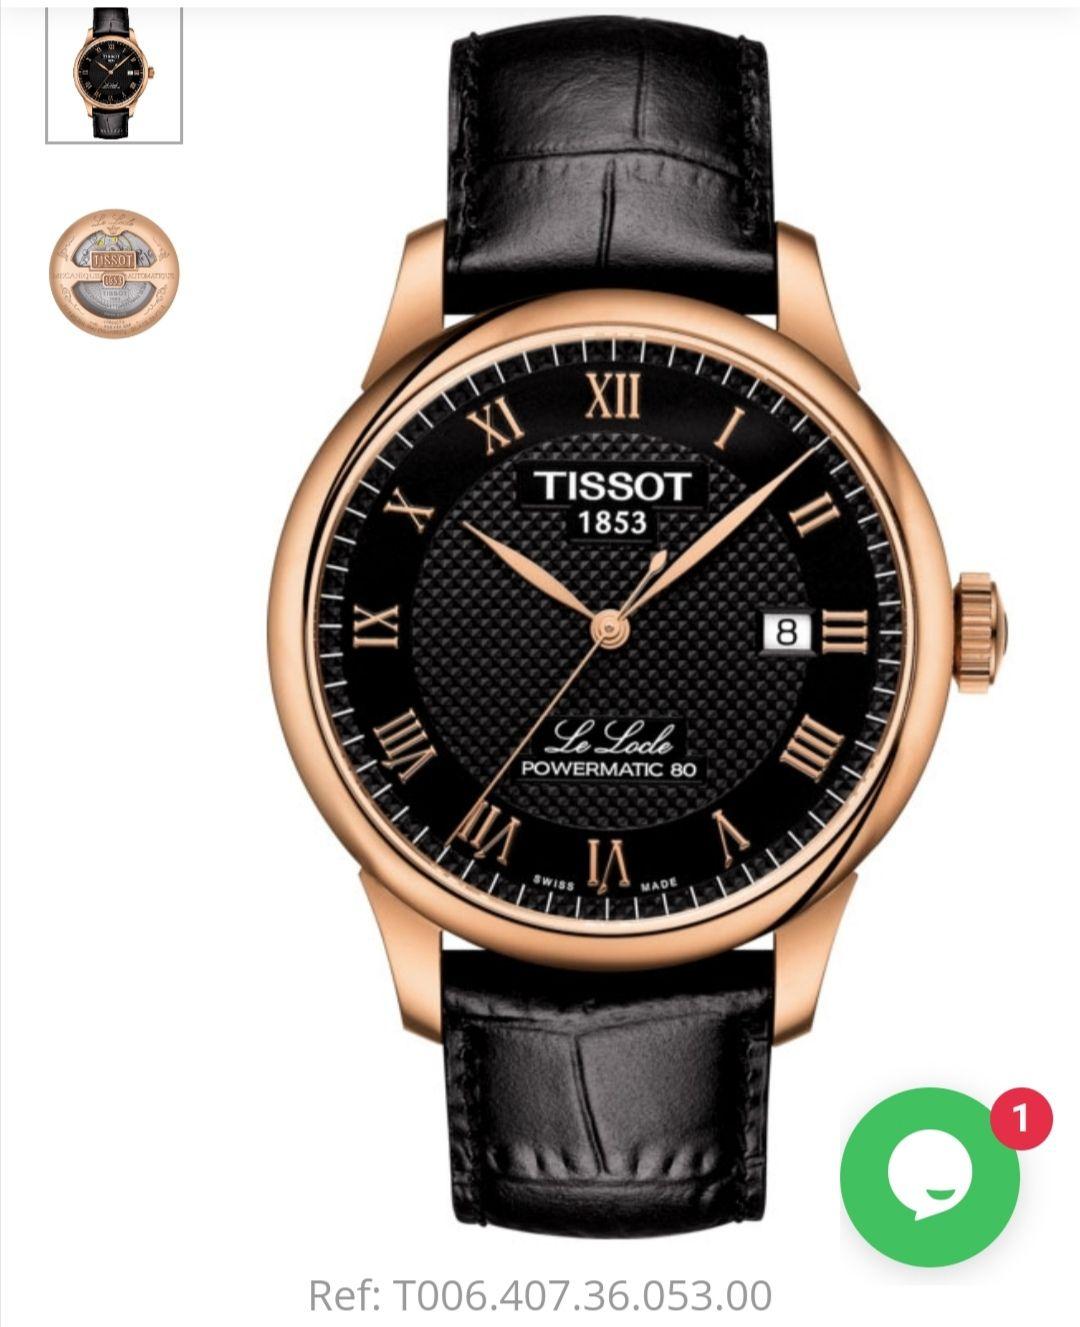 Mens Tissot Le Locle Powermatic80 Watch £315 Banks Lyon